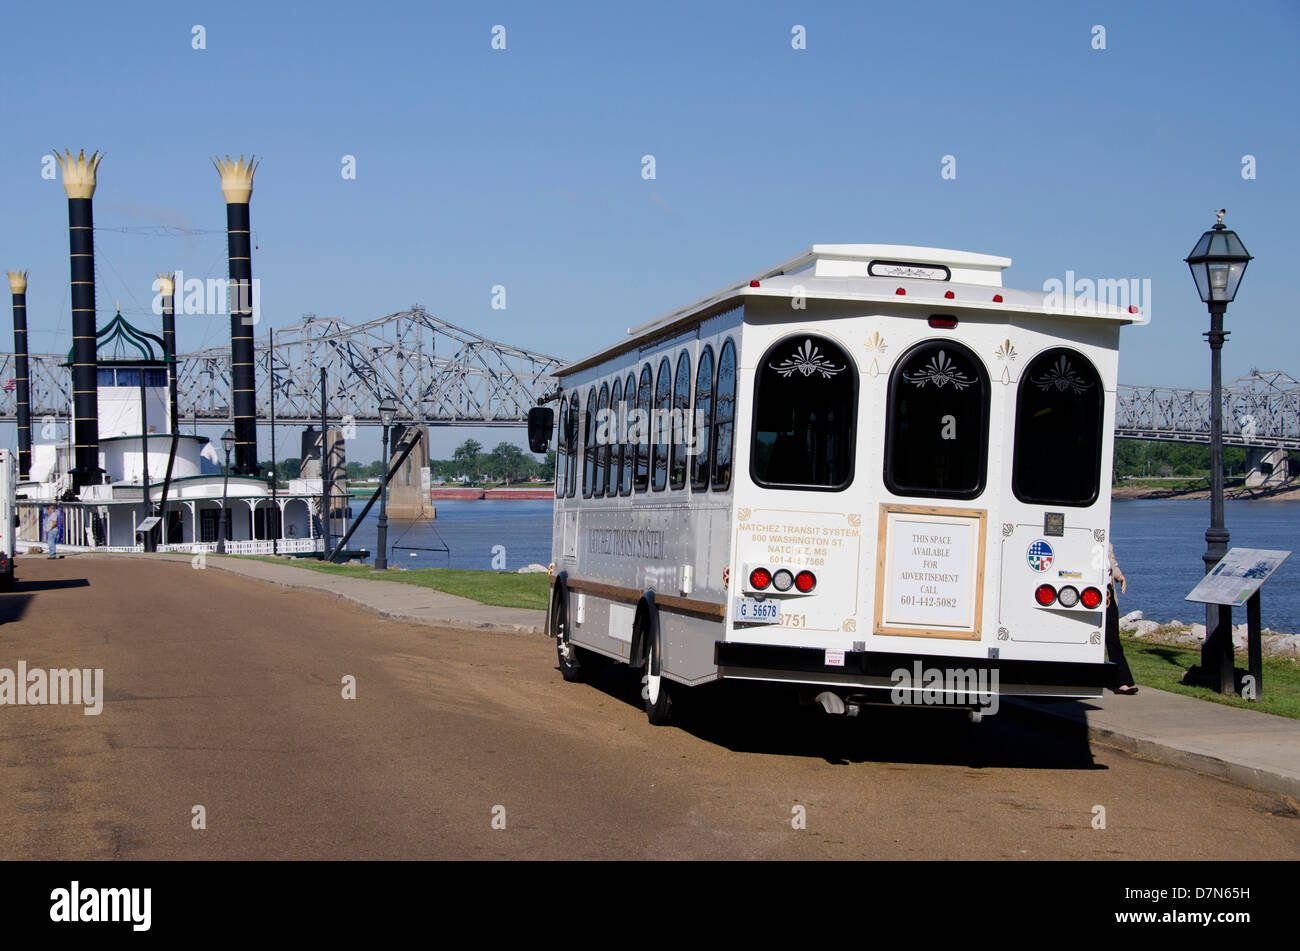 Casino bus in mississippi pay per click casino